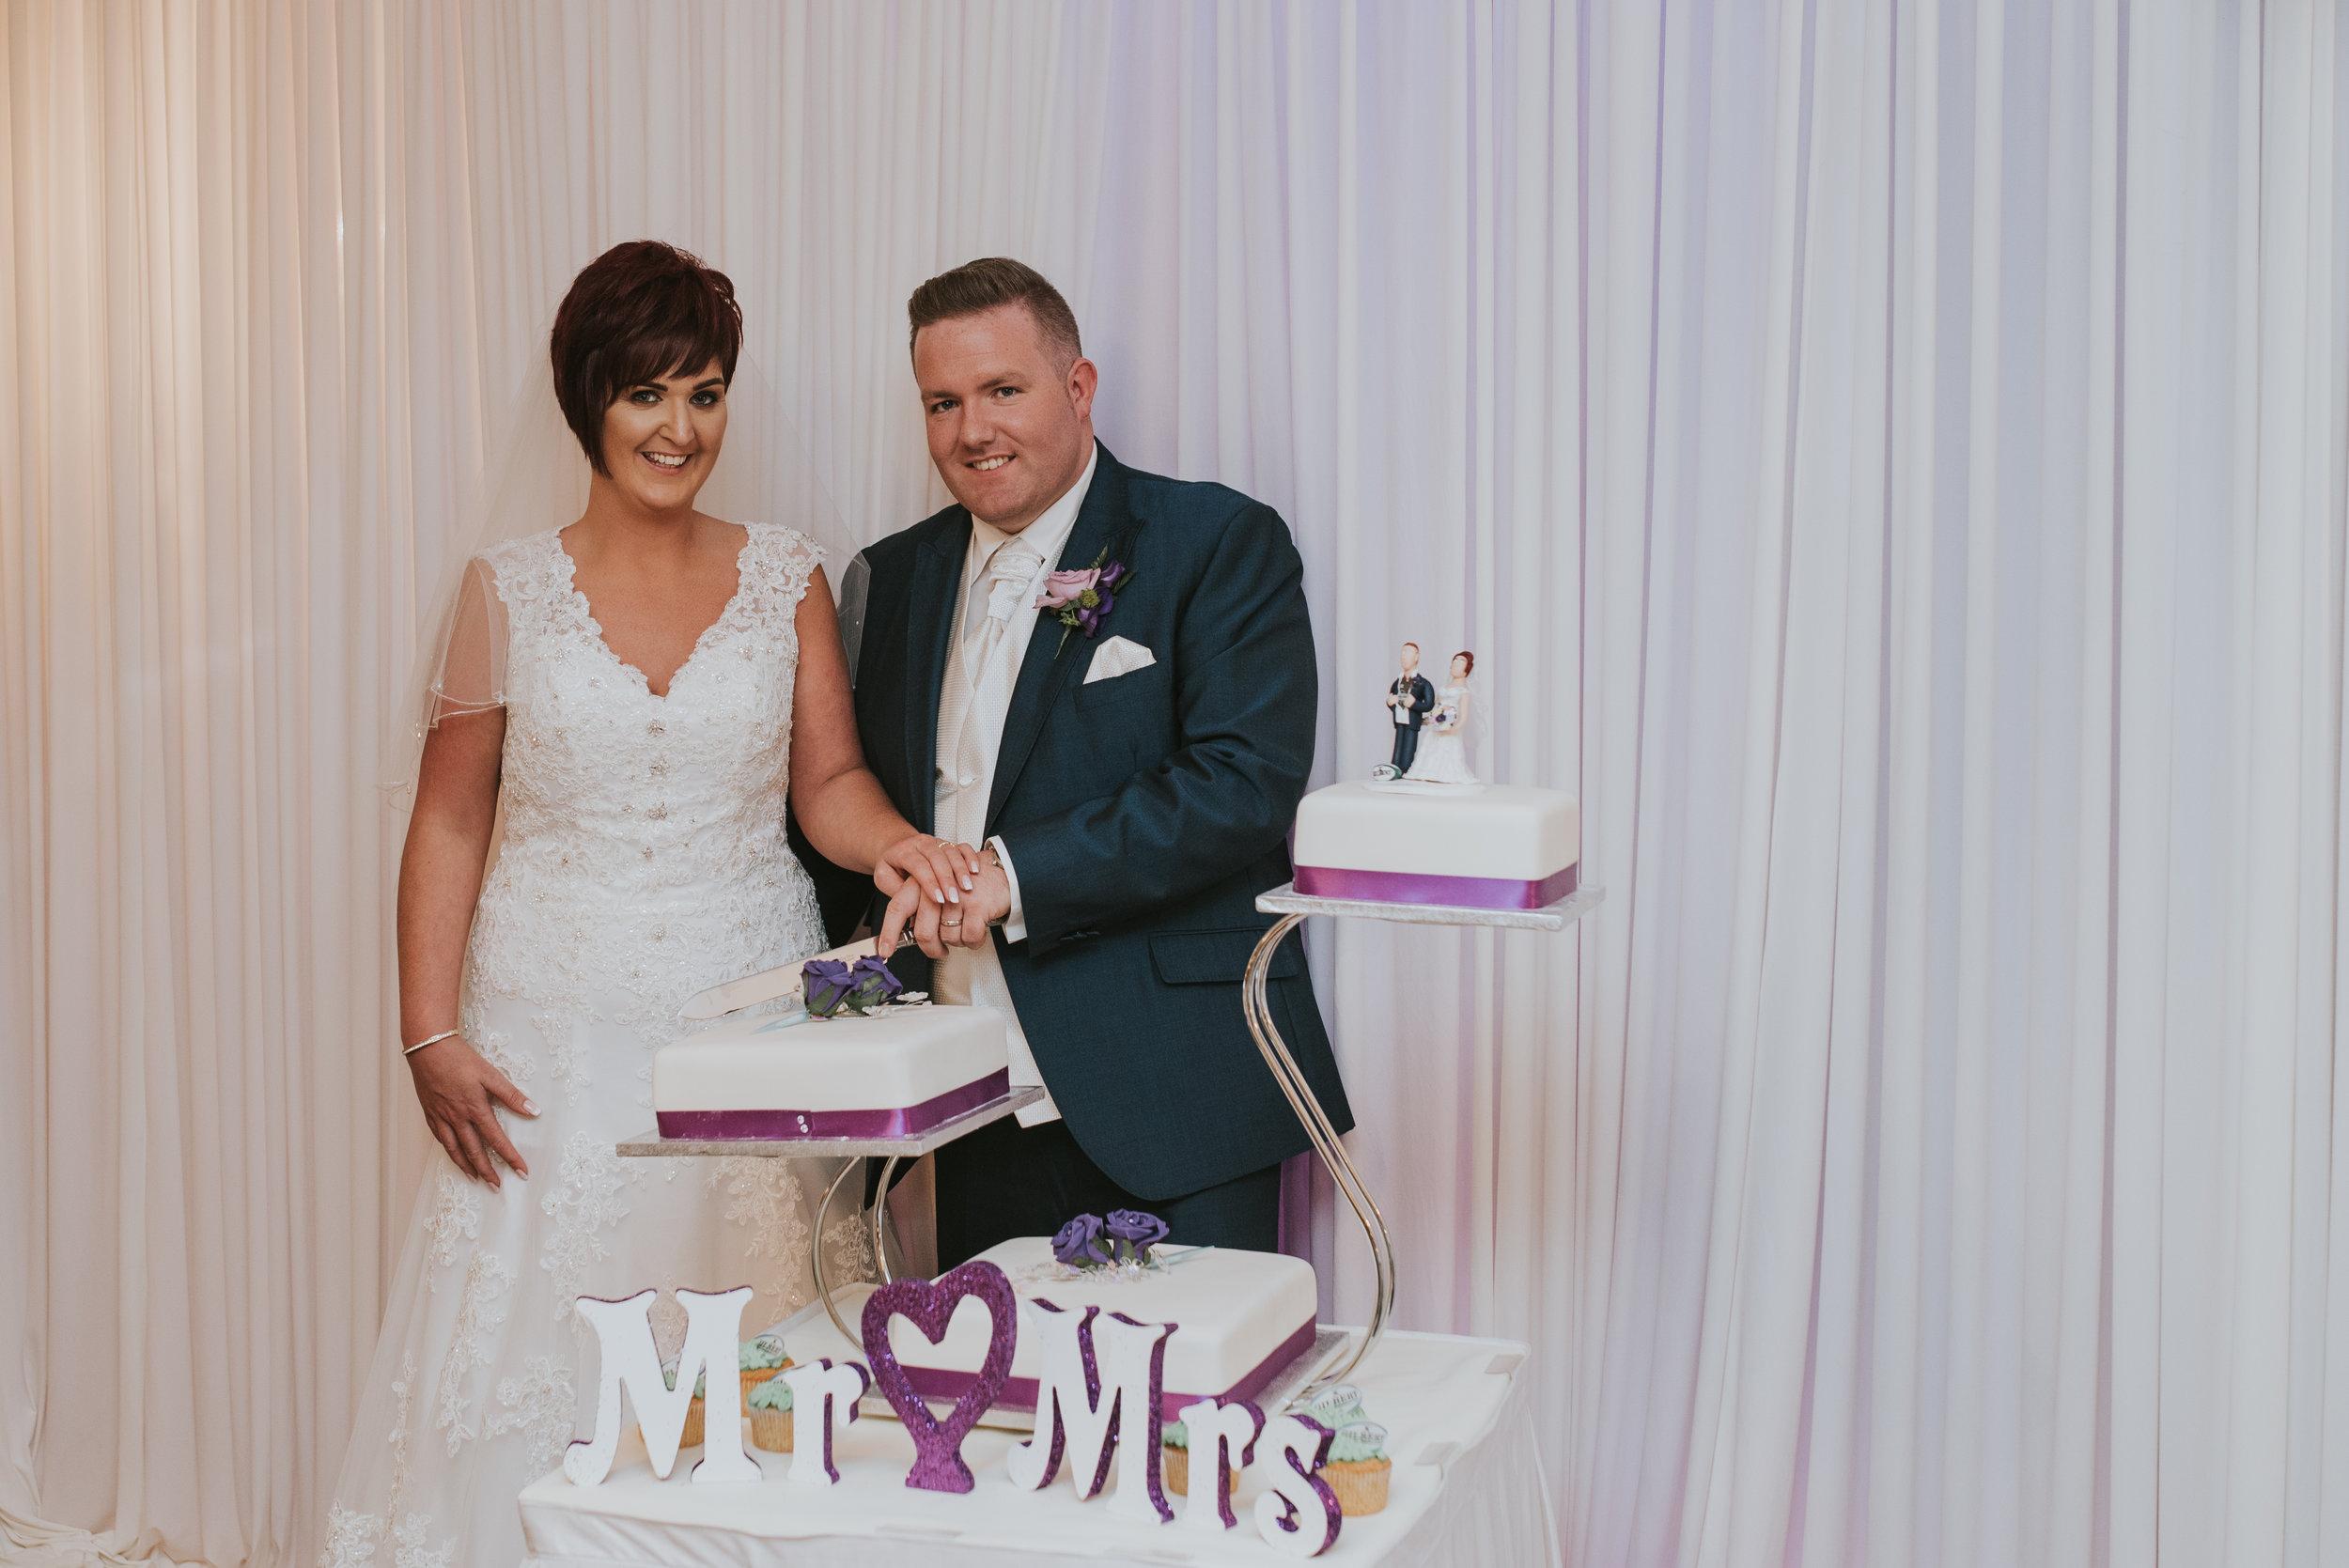 Bushtown Hotel Wedding Photographer Pure Photo N.I cutting the cake